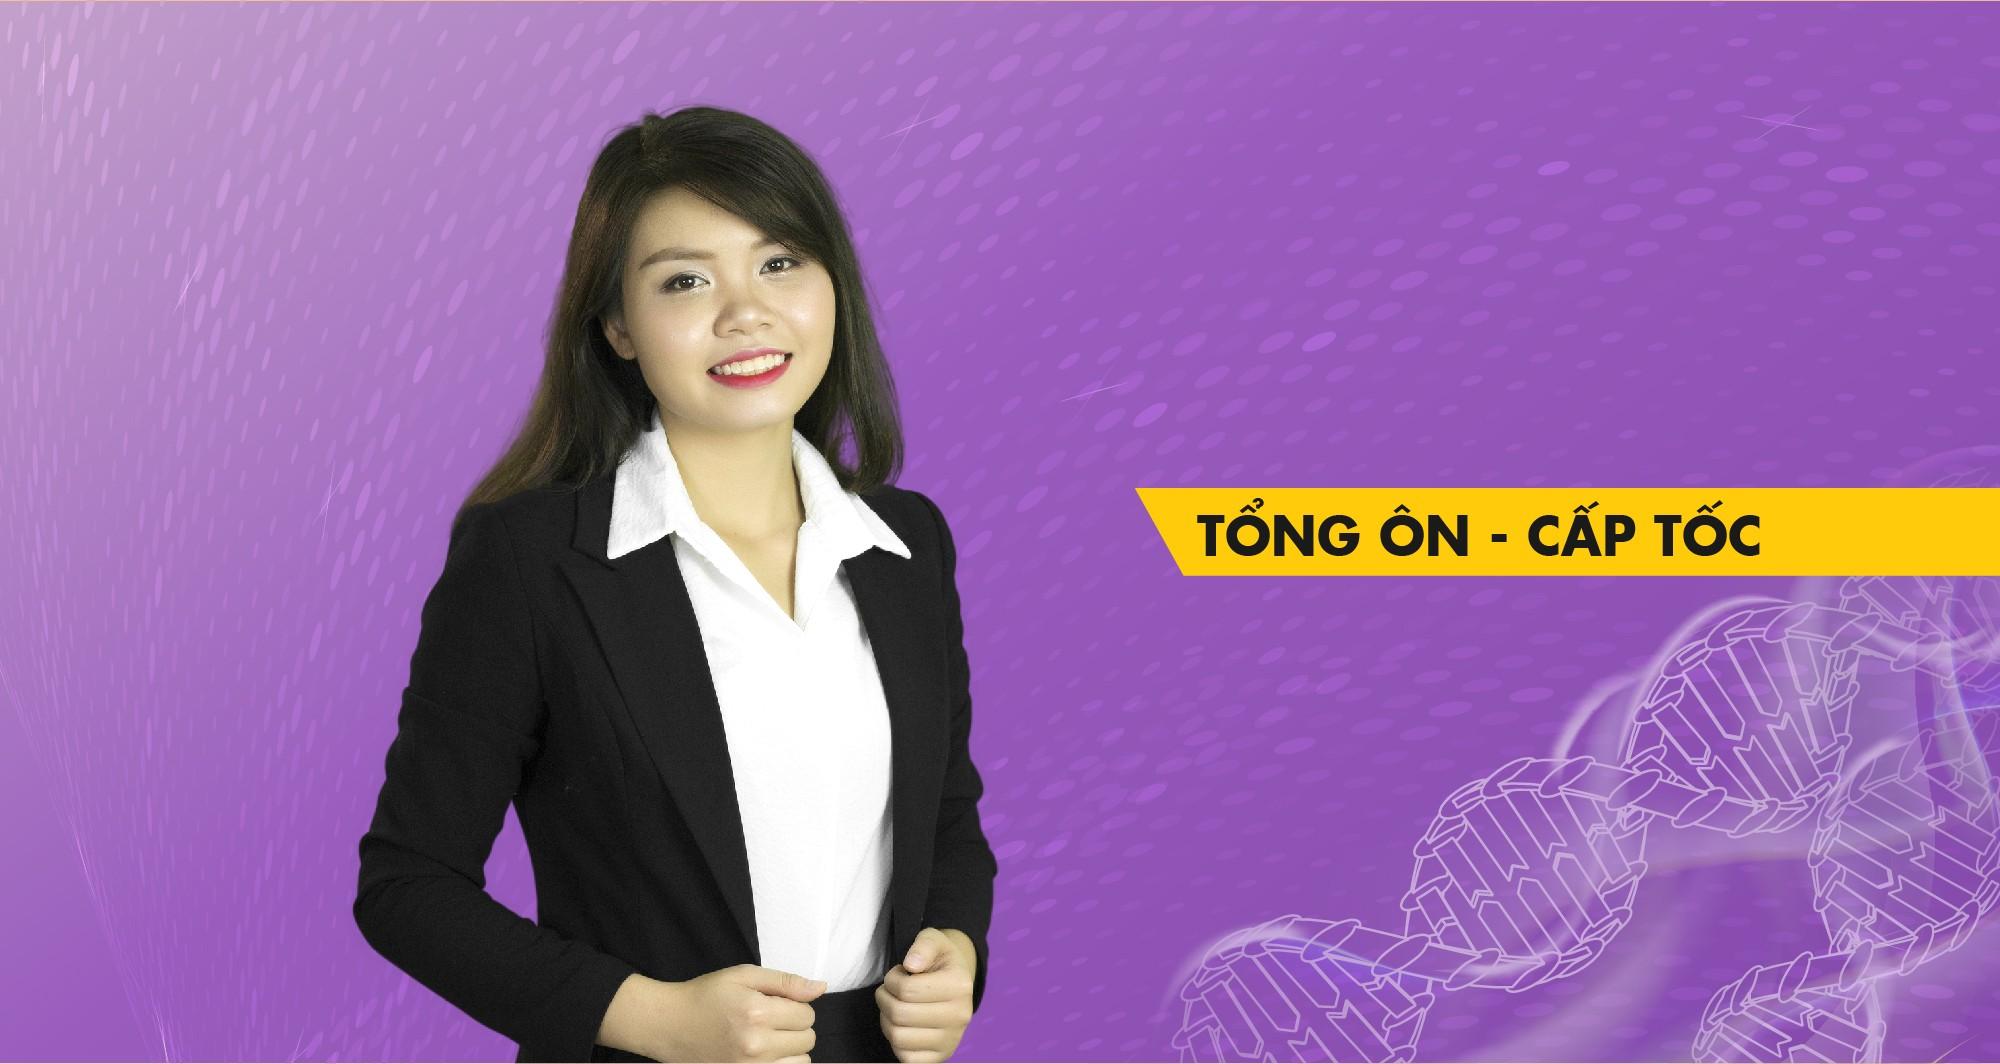 tong-on-cap-toc-sinh-hoc-thptqg